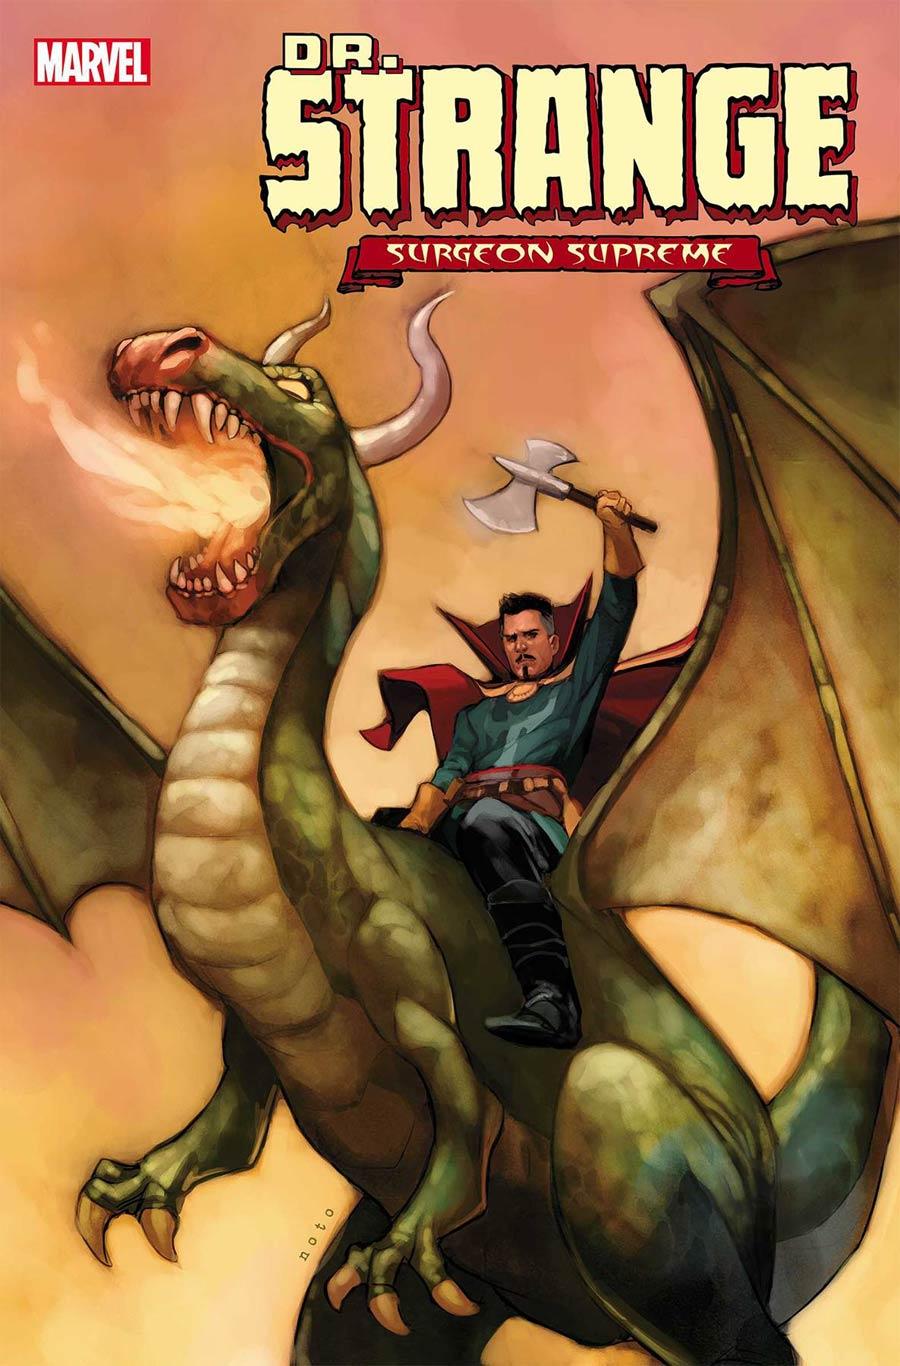 Doctor Strange Surgeon Supreme #3 Cover A Regular Phil Noto Cover